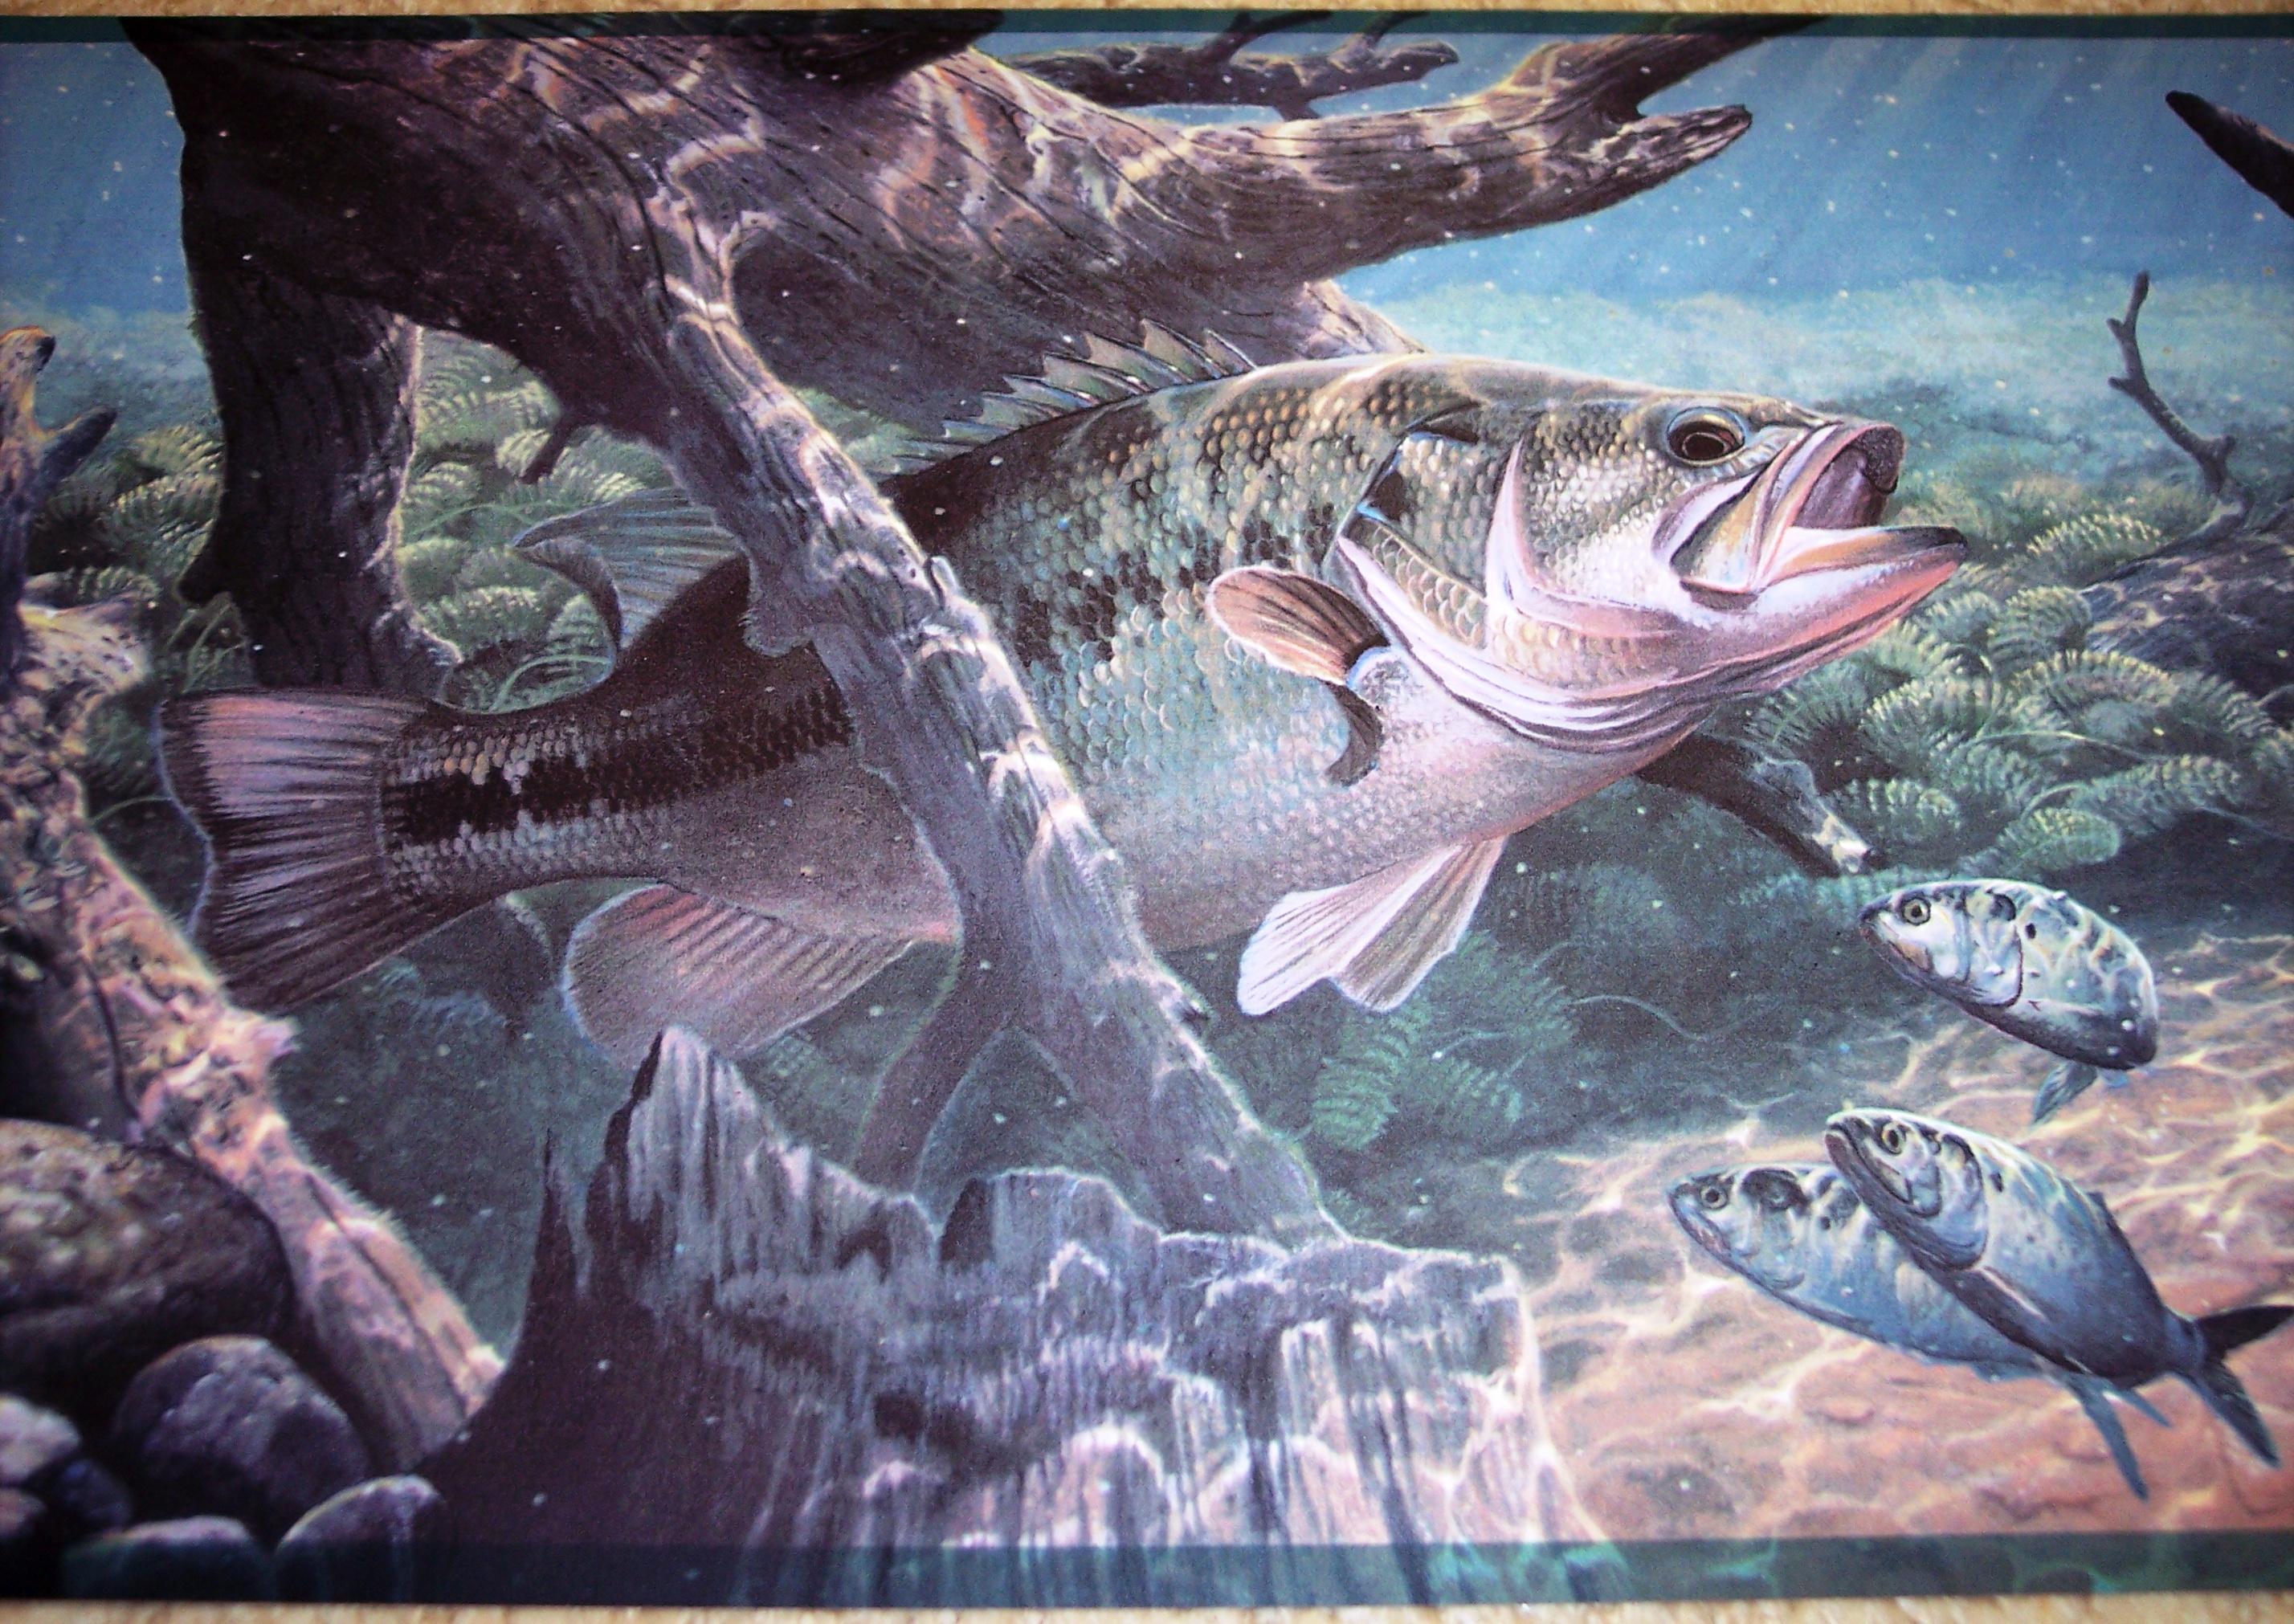 Bass Fishing Art Wallpapers 2856x2022